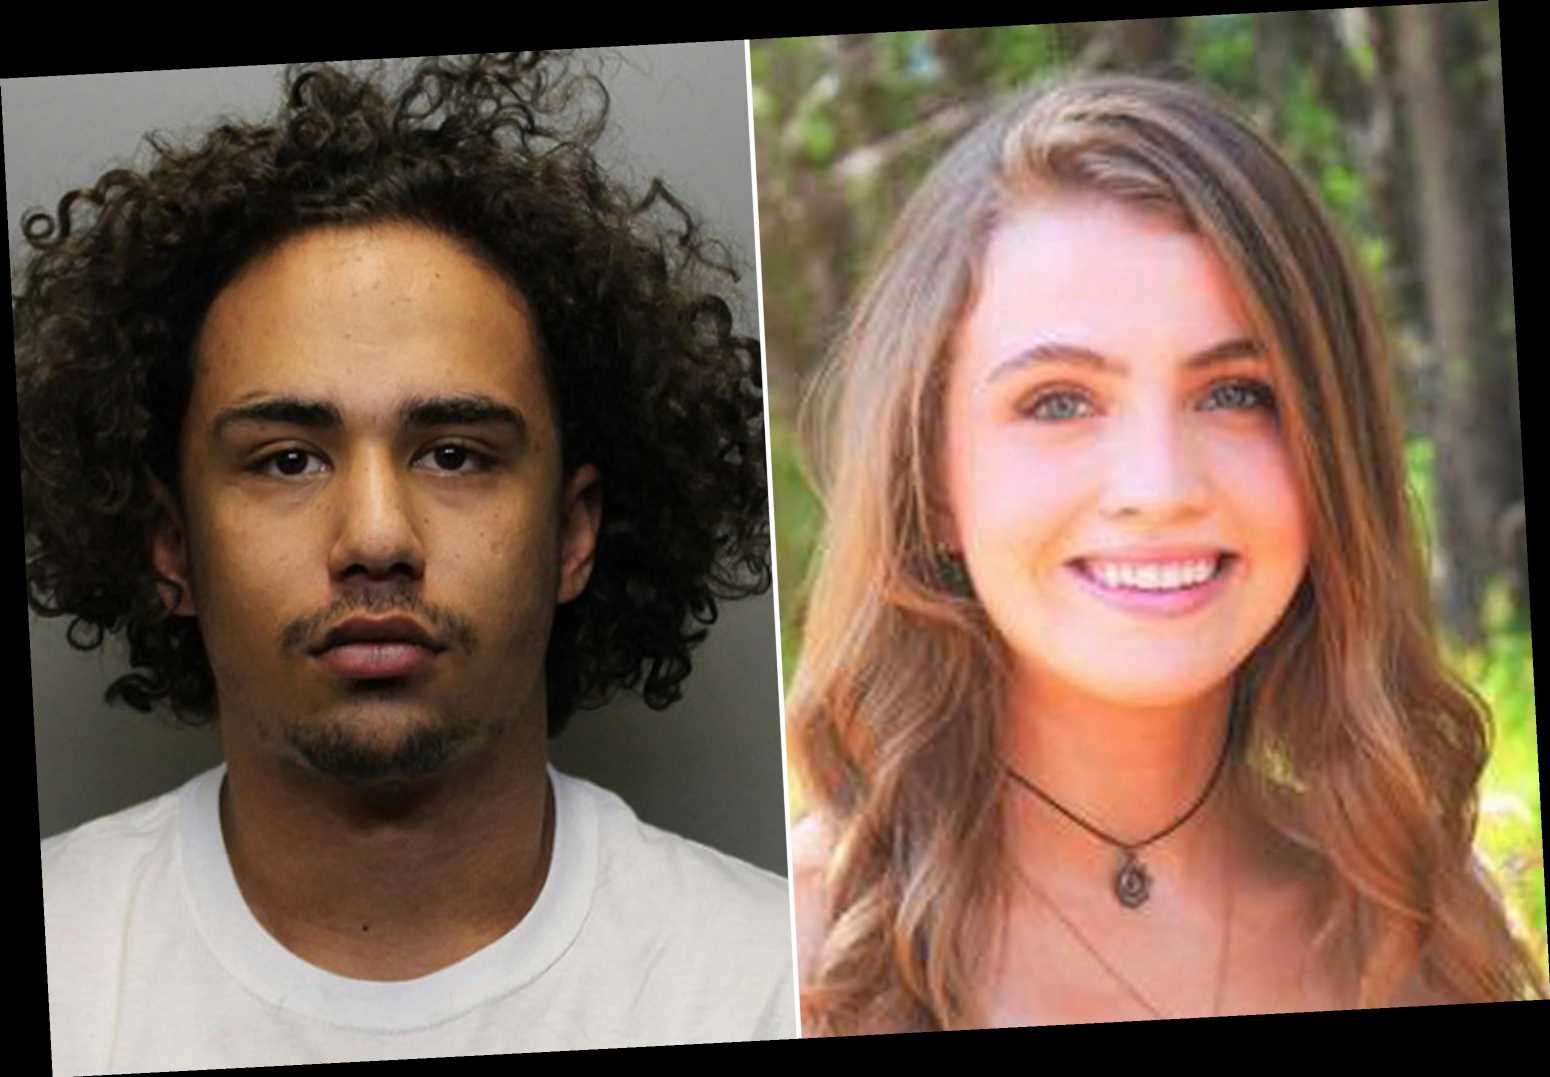 Colorado teen beaten to death in parking lot, ex-boyfriend arrested